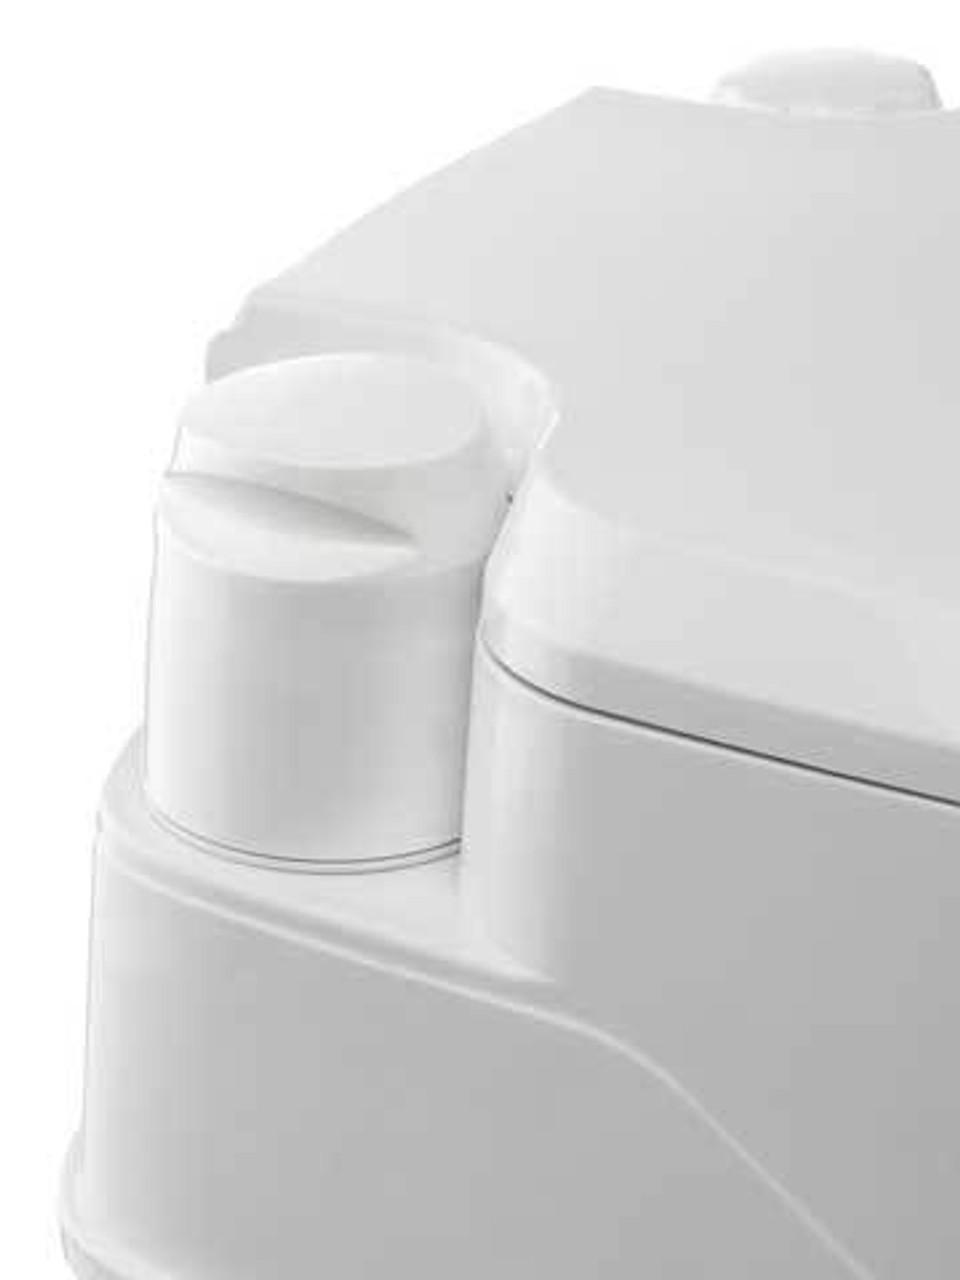 Thetford Porta Potti Qube 365 manual piston pump flush